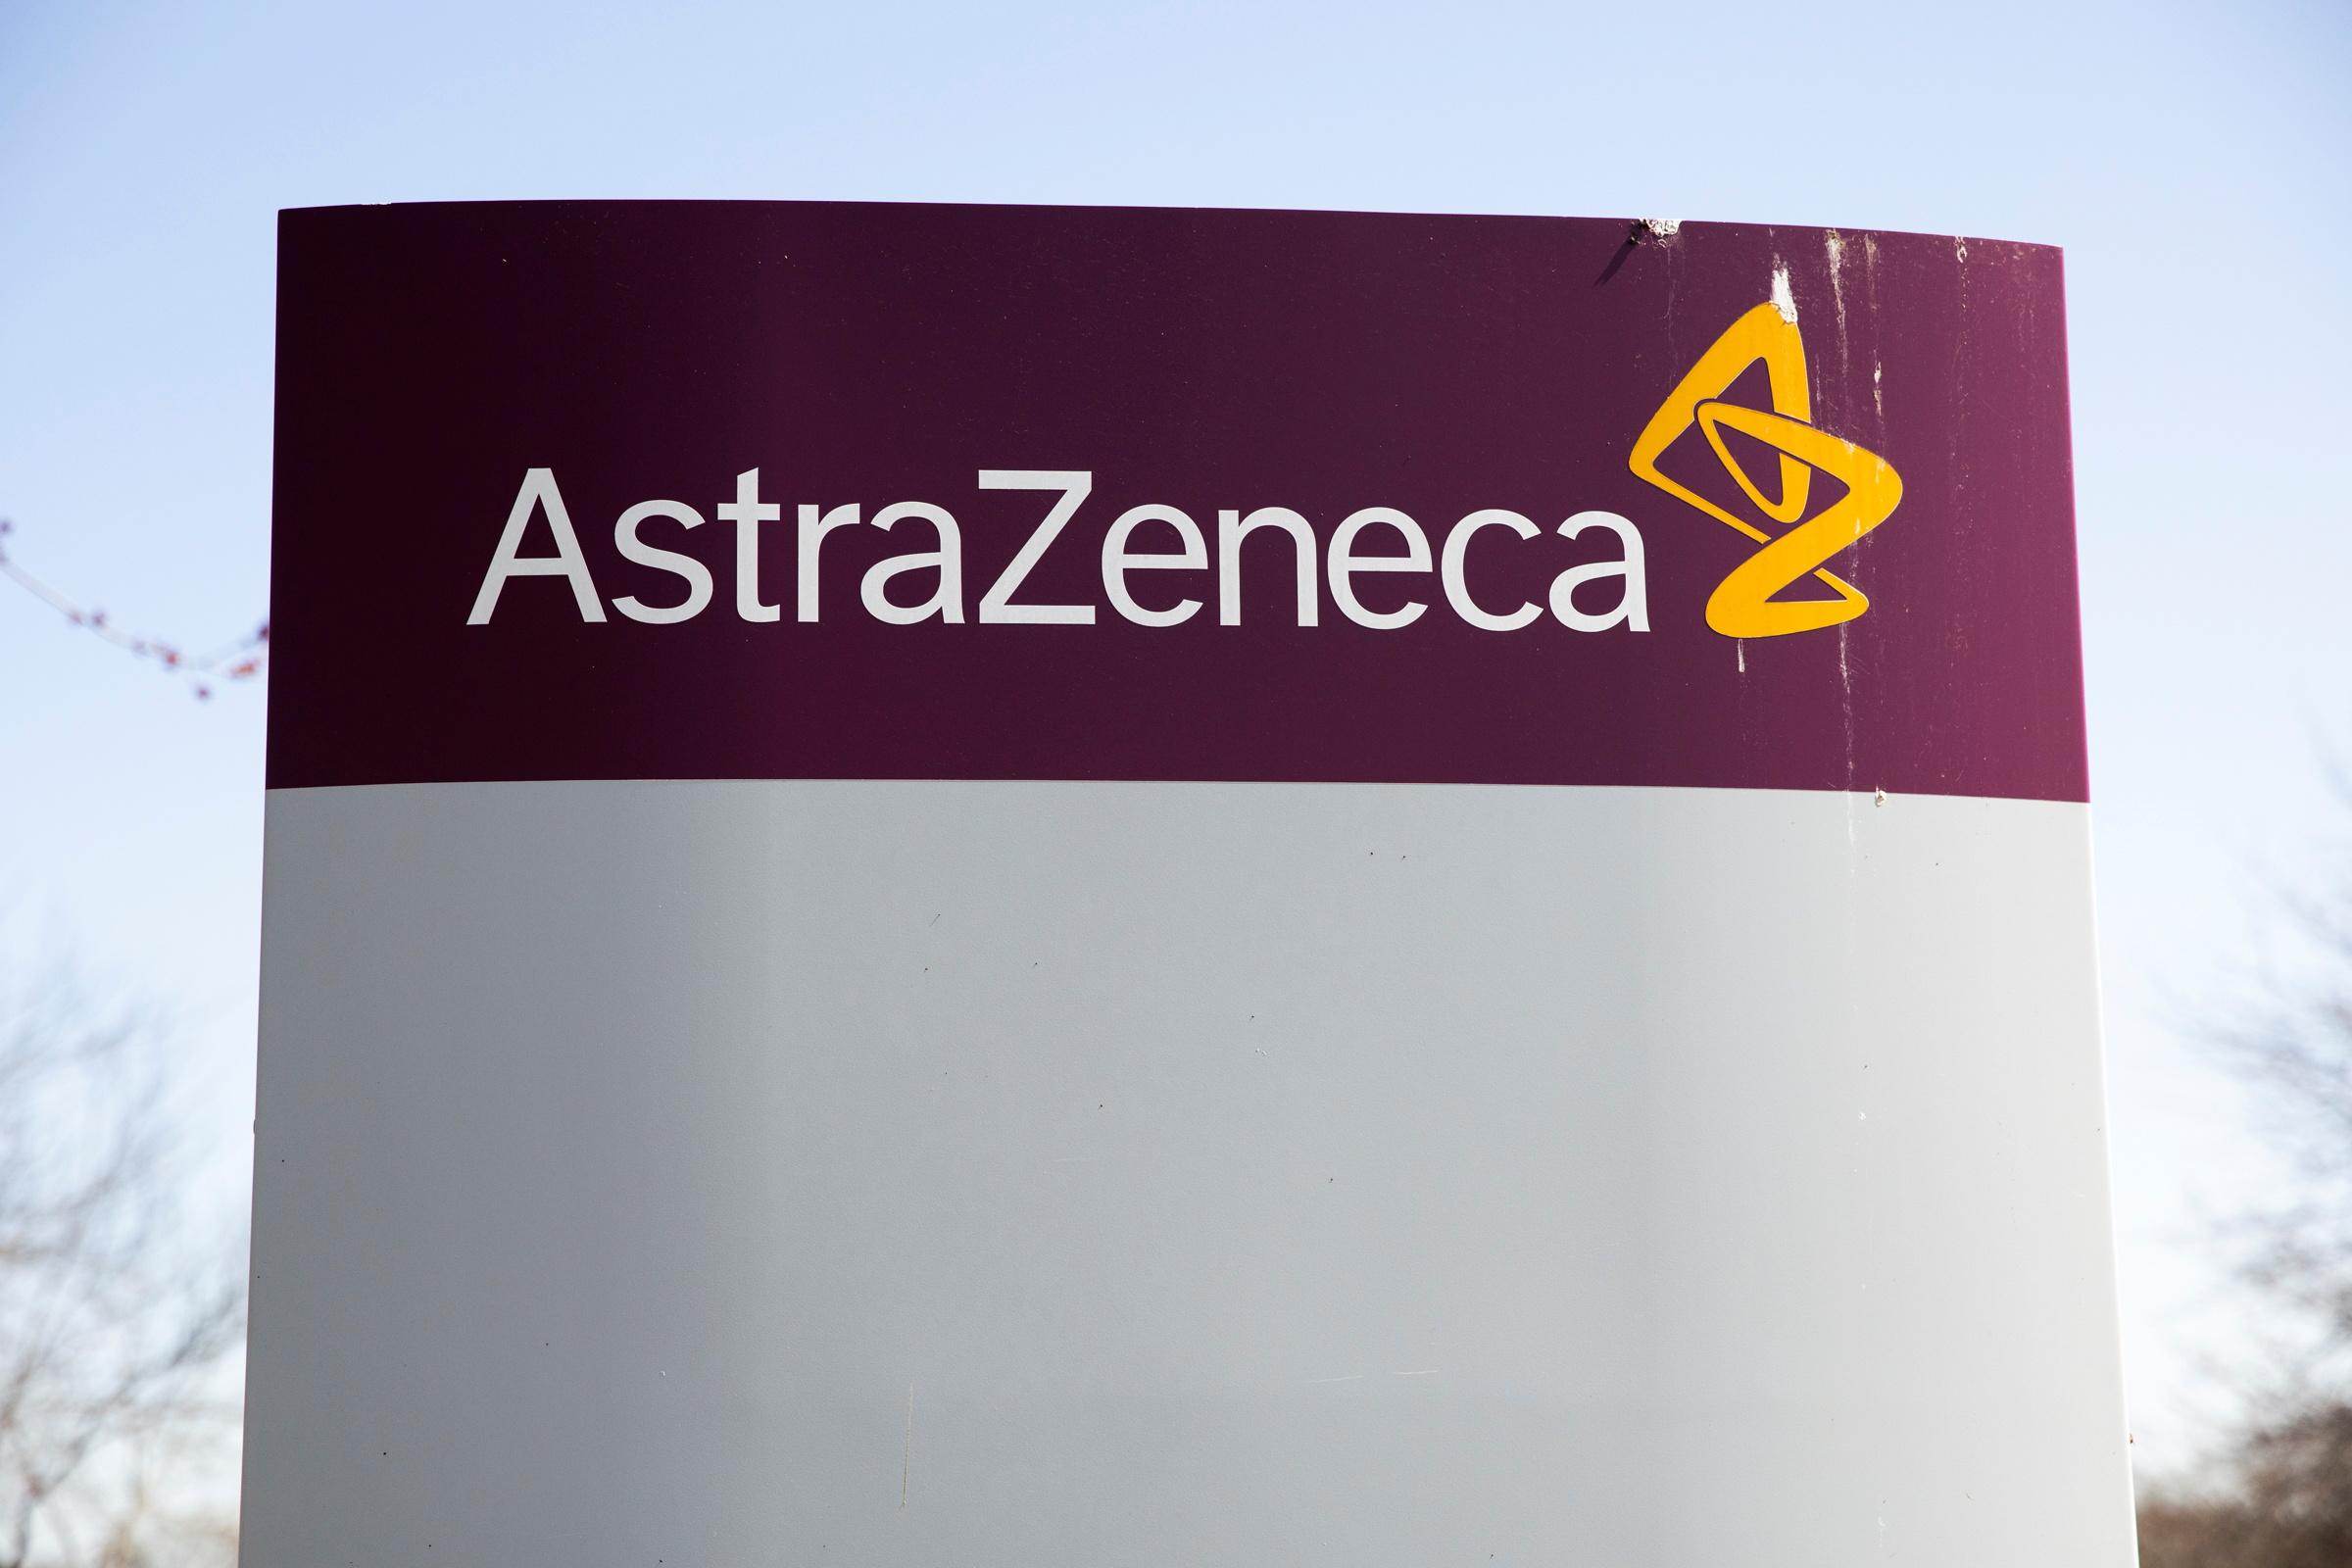 The logo for AstraZeneca is seen outside its North America headquarters in Wilmington, Delaware, U.S., March 22, 2021.  REUTERS/Rachel Wisniewski